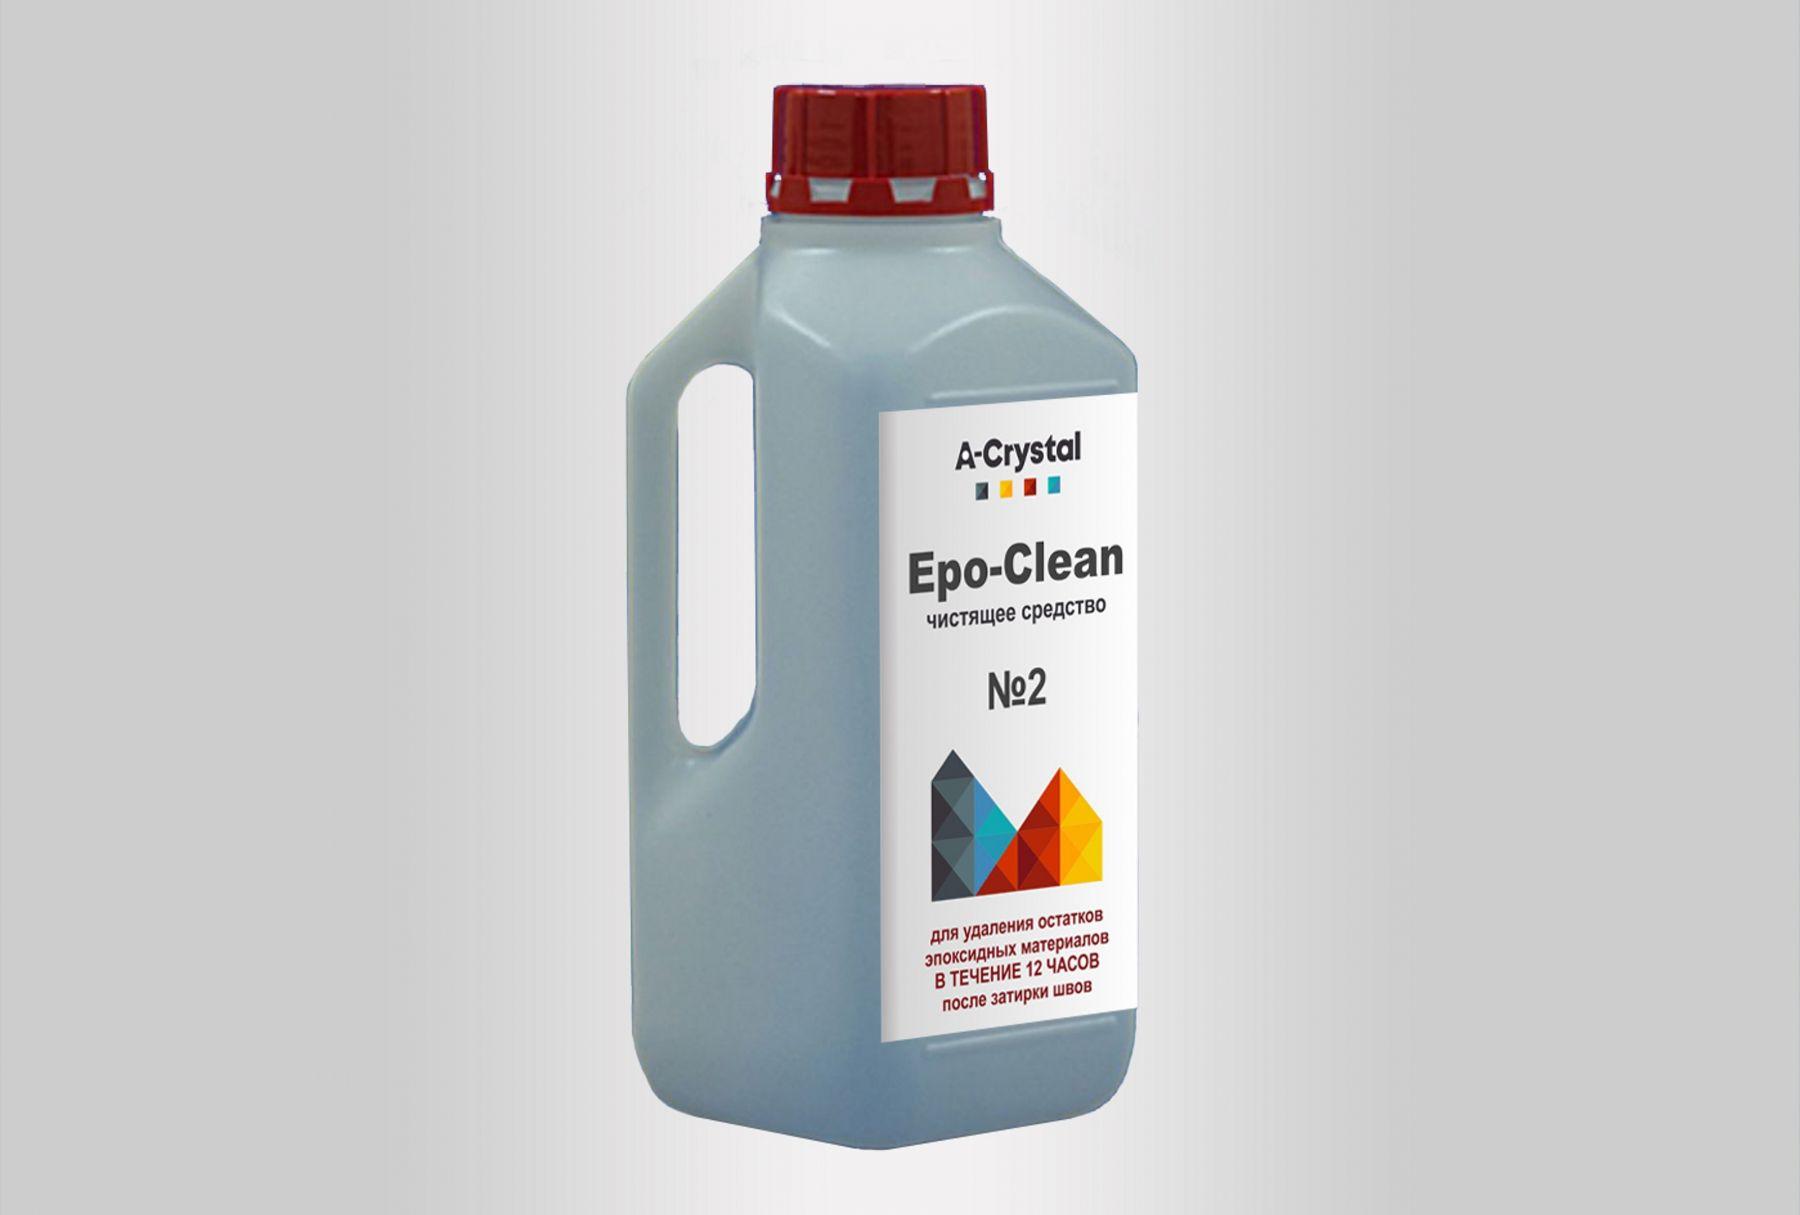 Очиститель затирки Epo-Clean №2 1кг.6 часов